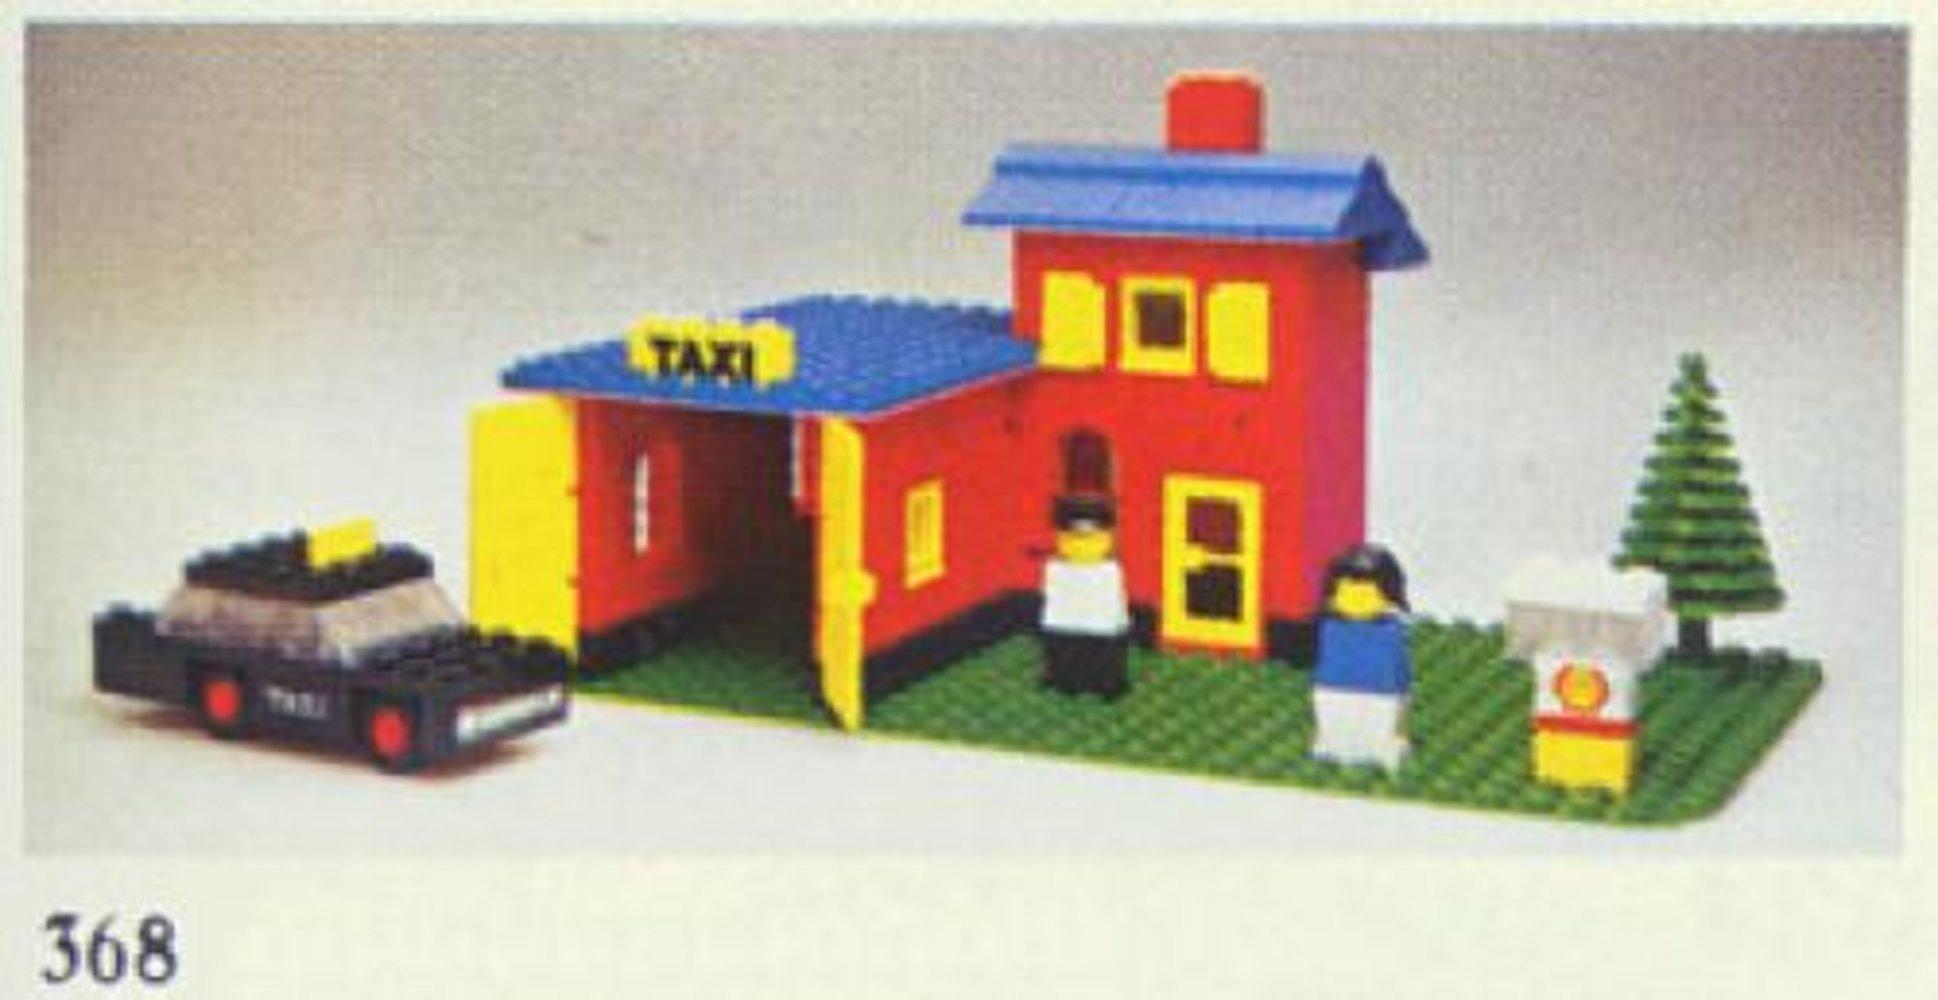 Taxi Garage